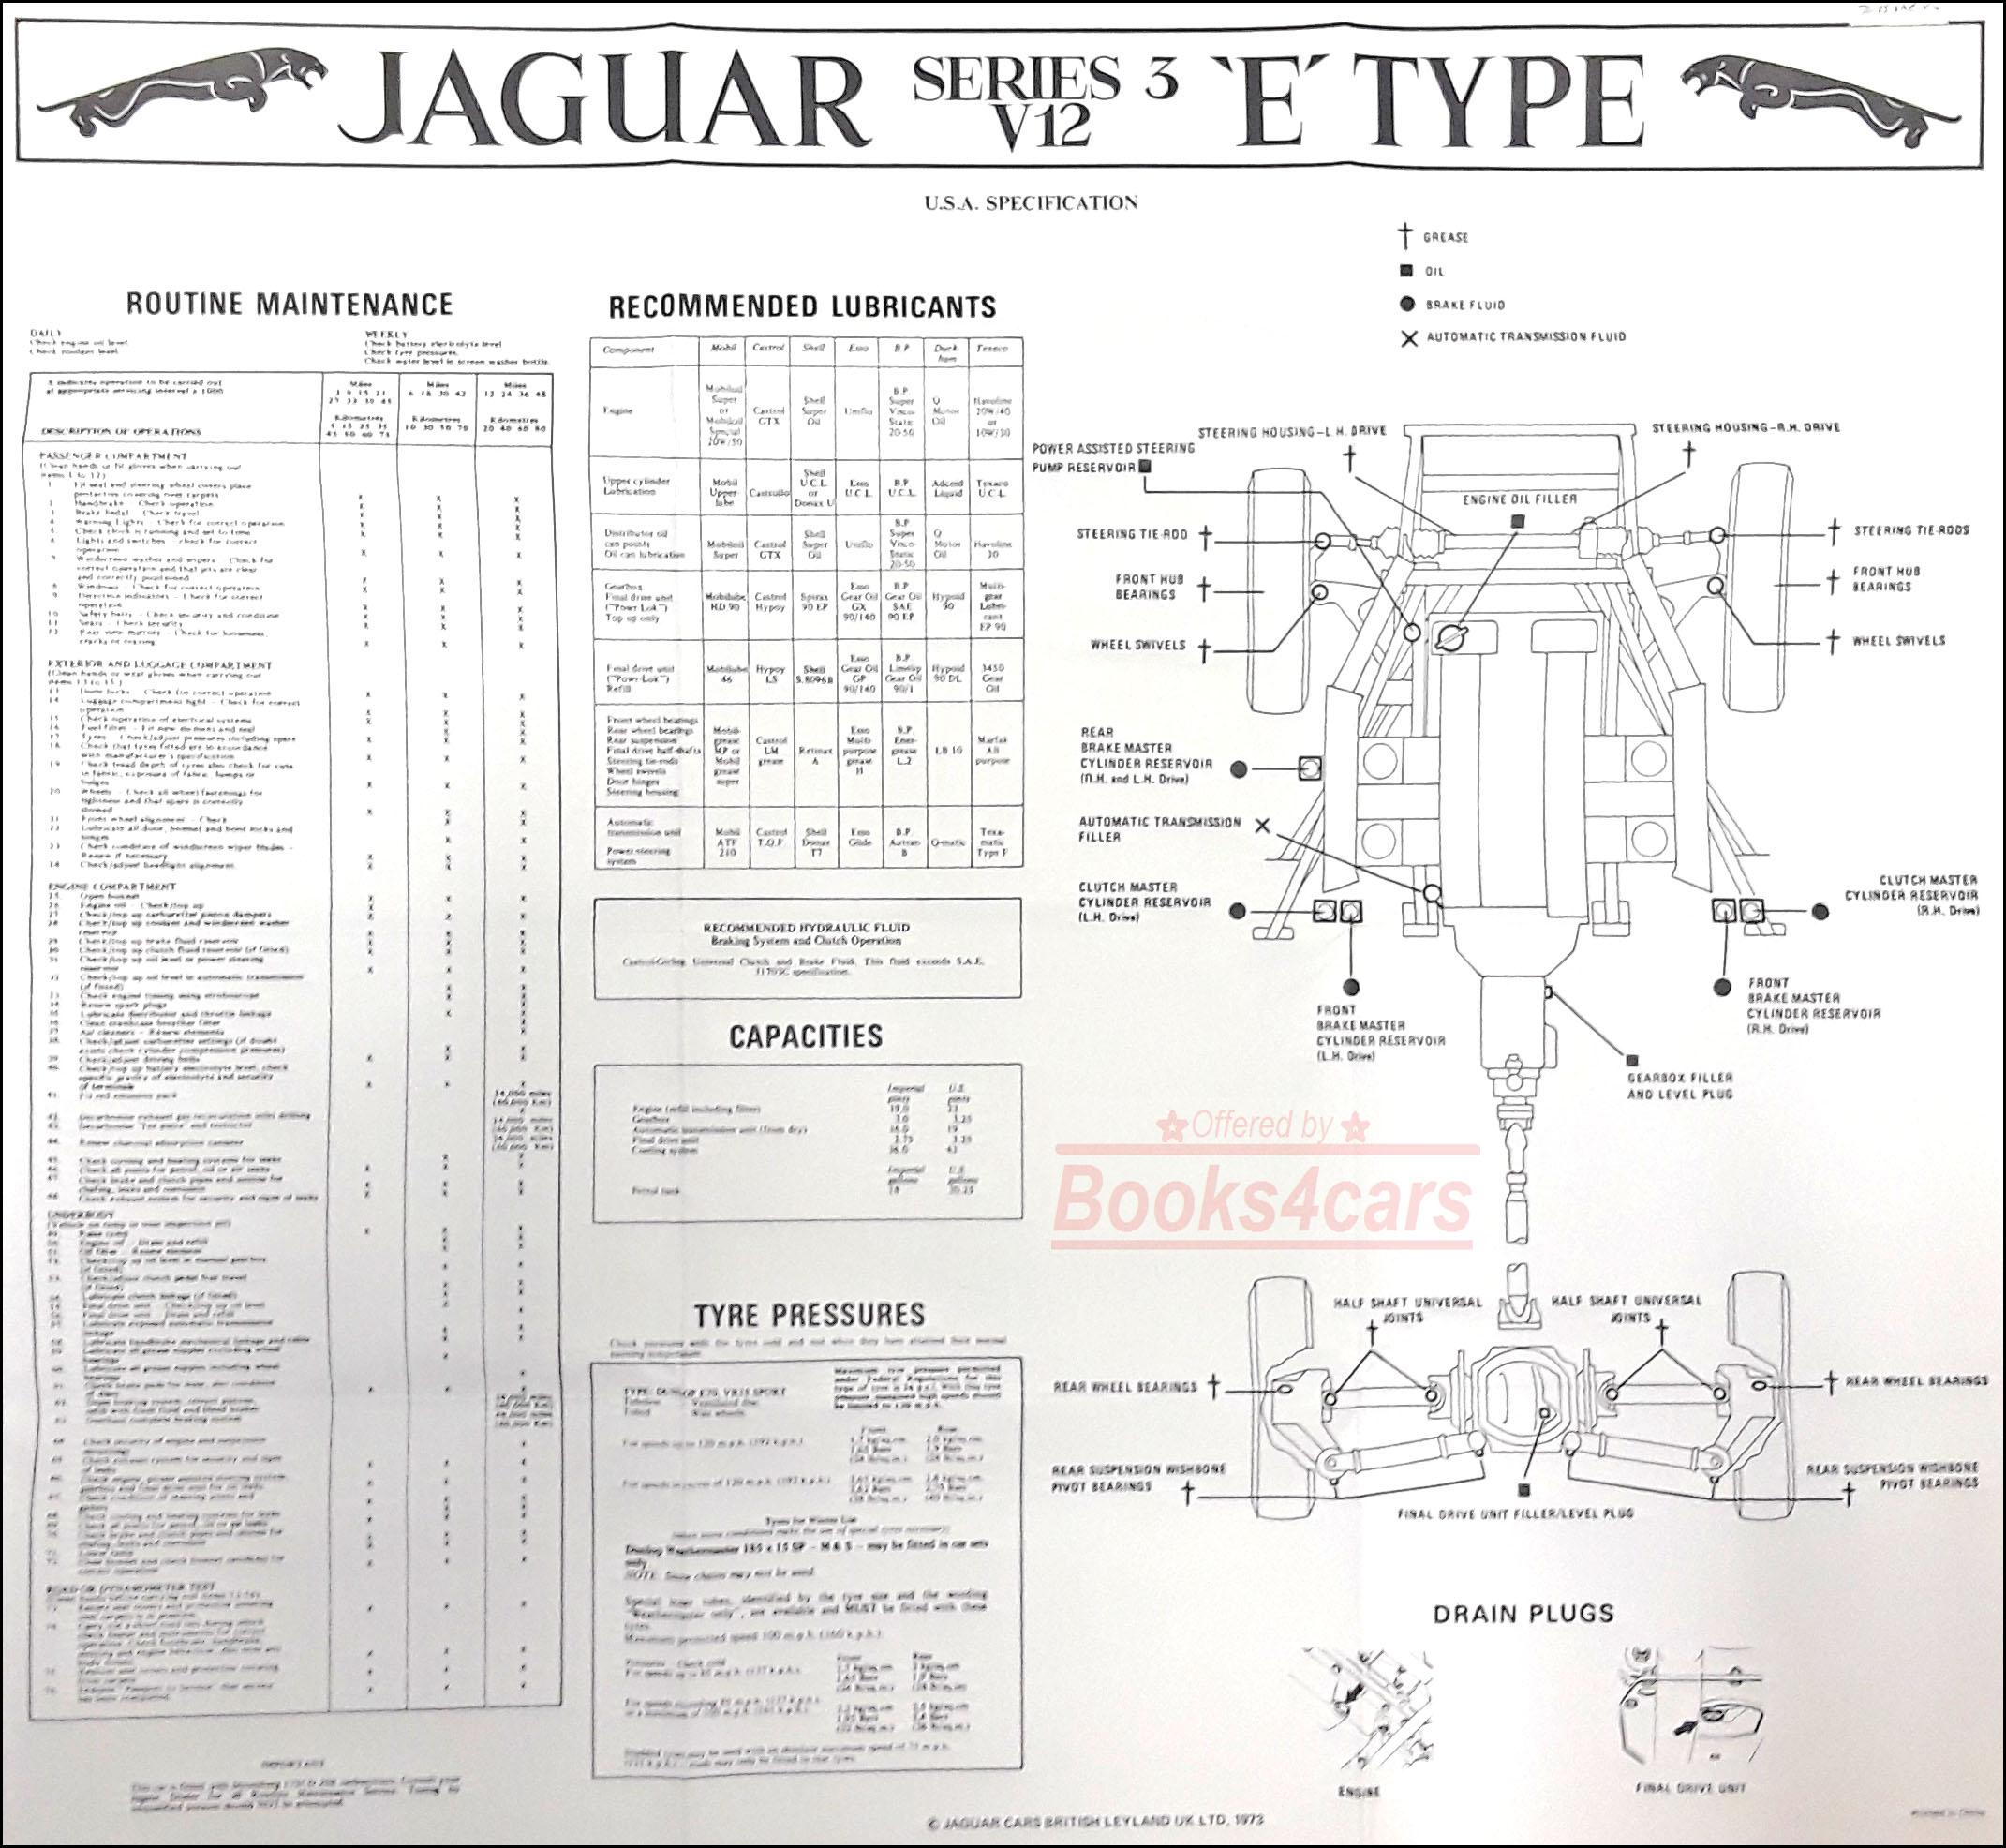 1507B Jaguar E Type Series 2 Wiring Diagram | Wiring Resources on jaguar e type accessories, volvo wiring diagram, jaguar x-type engine compartment diagram, chevrolet wiring diagram, bentley wiring diagram, honda wiring diagram, e-type jaguar fuel gauge diagram, bmw wiring diagram, ford wiring diagram, mgb wiring diagram, vw type 3 wiring diagram, jaguar e type transmission, triumph wiring diagram, jaguar x-type repair manual, audi 80 wiring diagram, jaguar xj6 exhast diagram, jaguar e type engine, dodge wiring diagram, toyota wiring diagram, volkswagen wiring diagram,